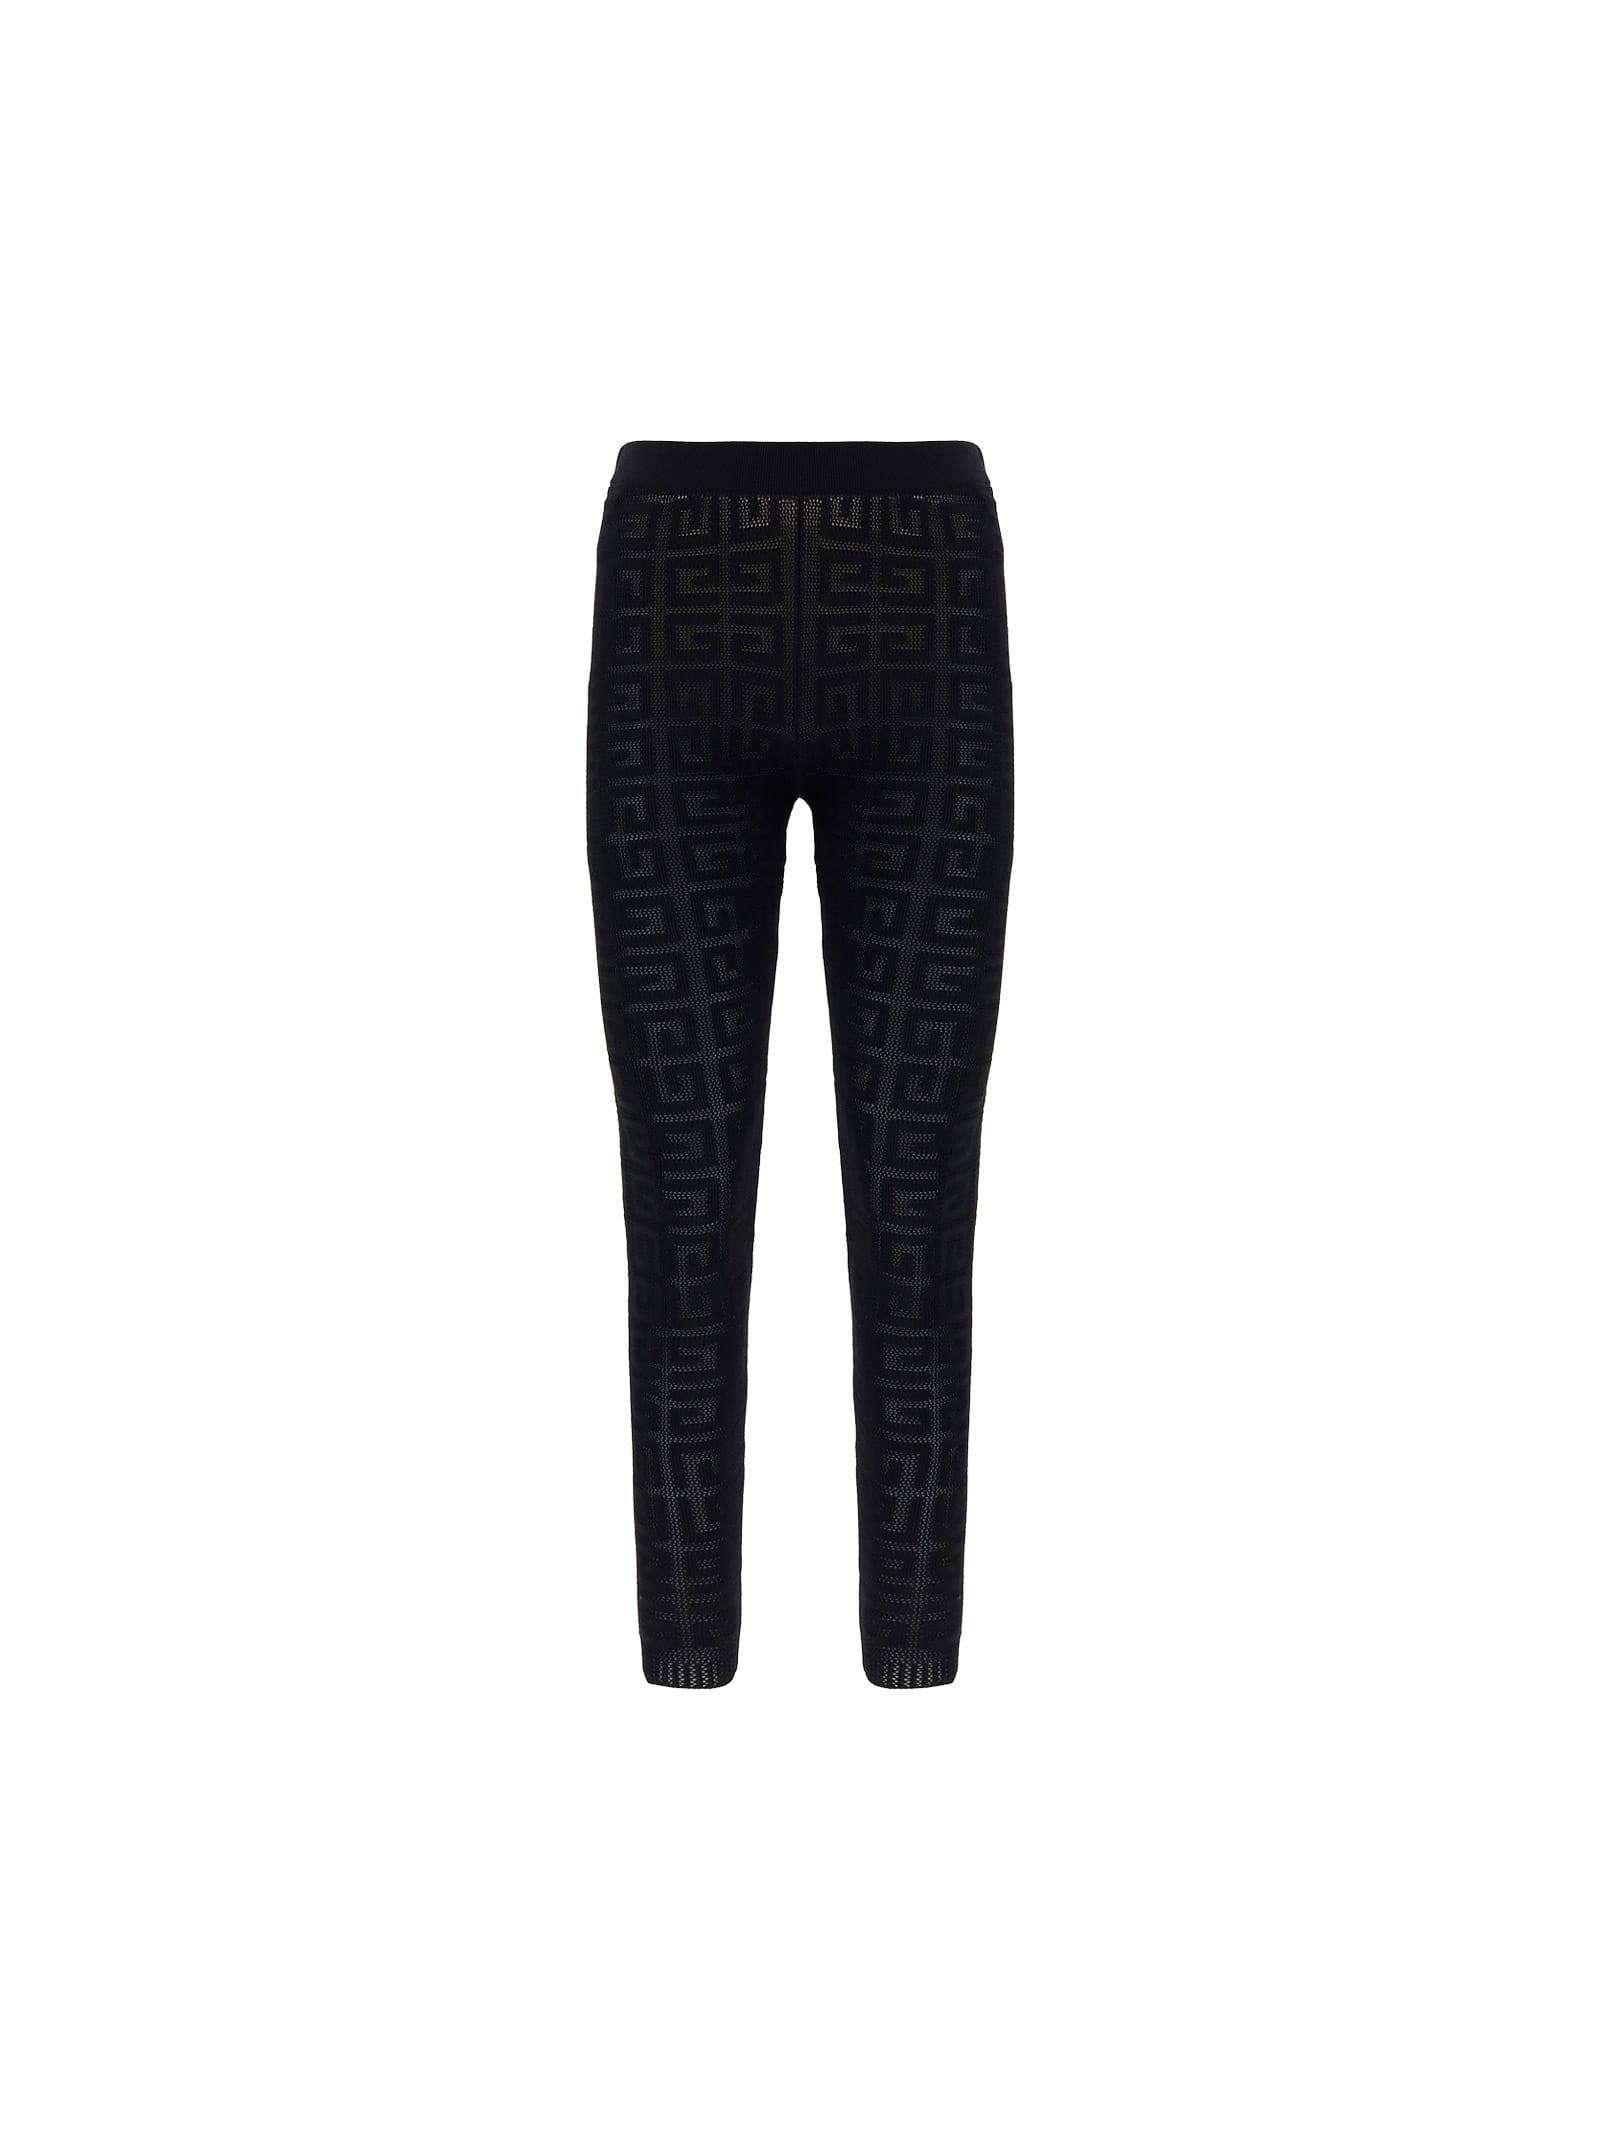 Givenchy Leggings In Black